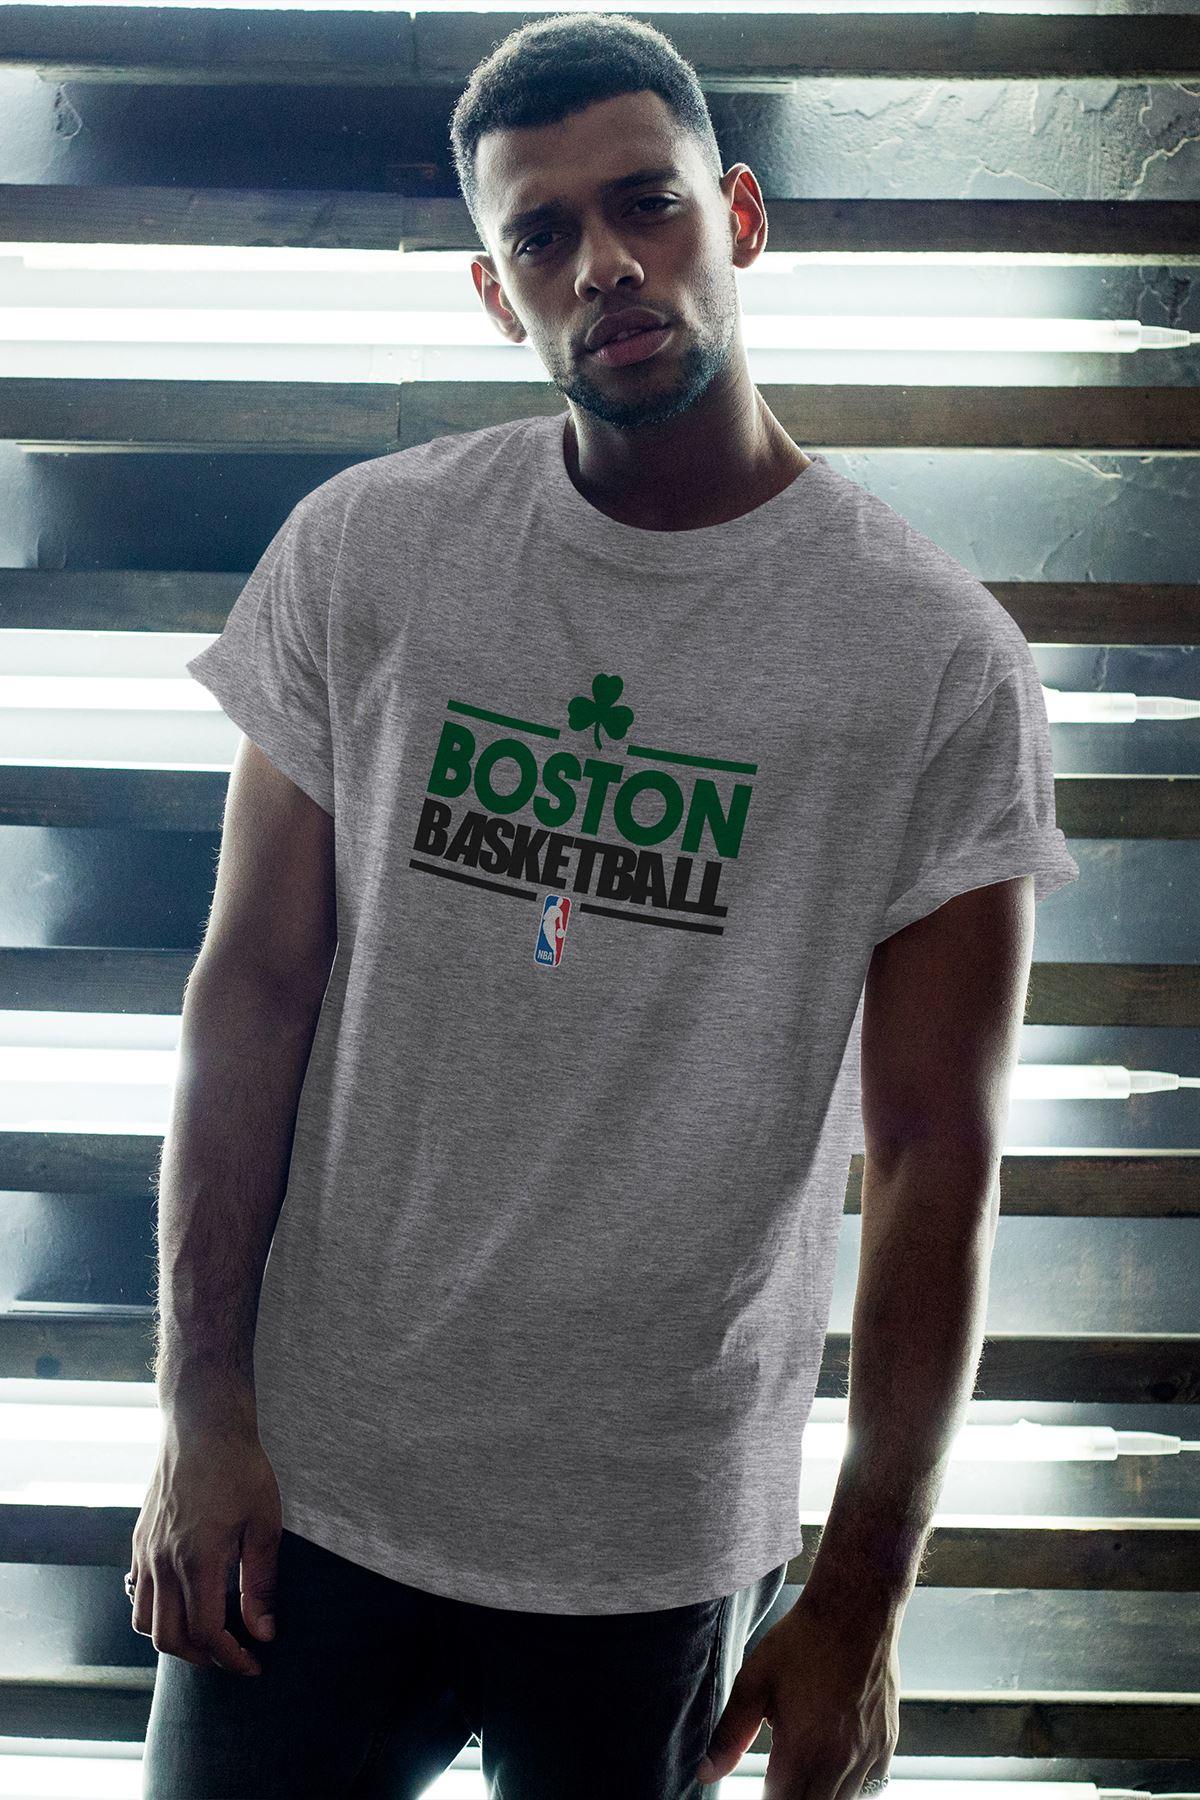 Boston Celtics 34 Gri Erkek Oversize Tshirt - Tişört